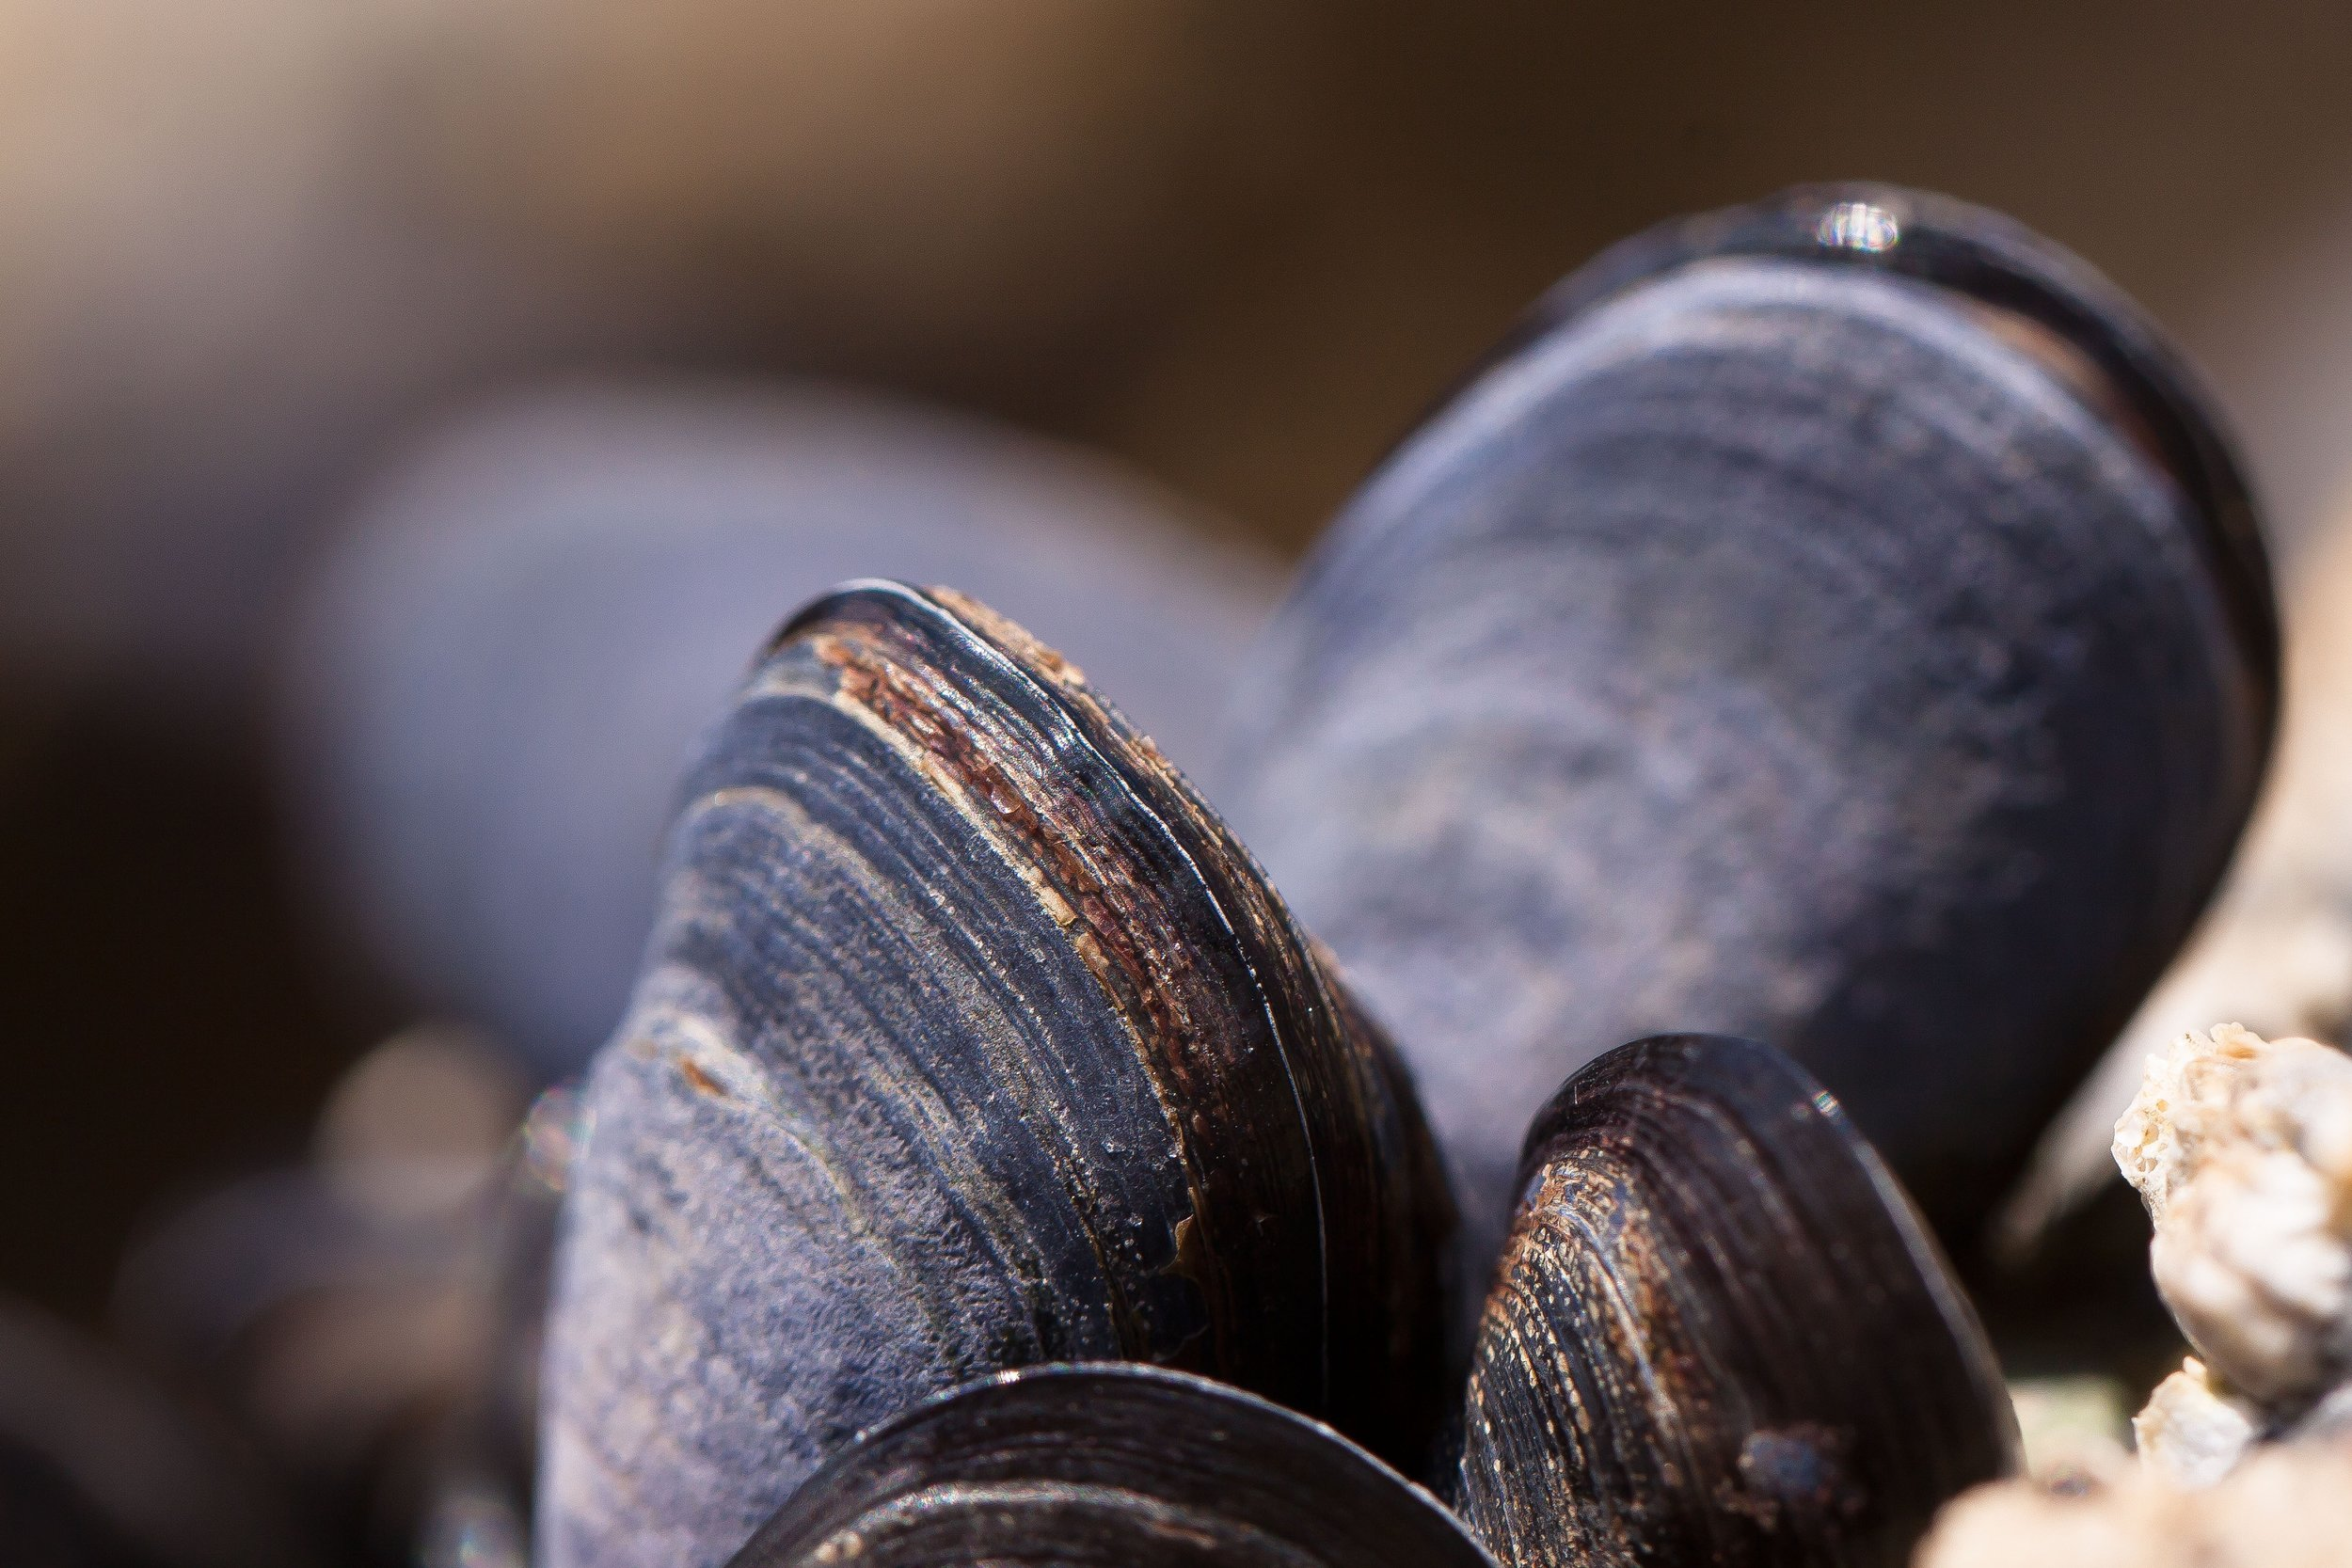 mussels-shells-mytilus-watt-area-53131.jpeg